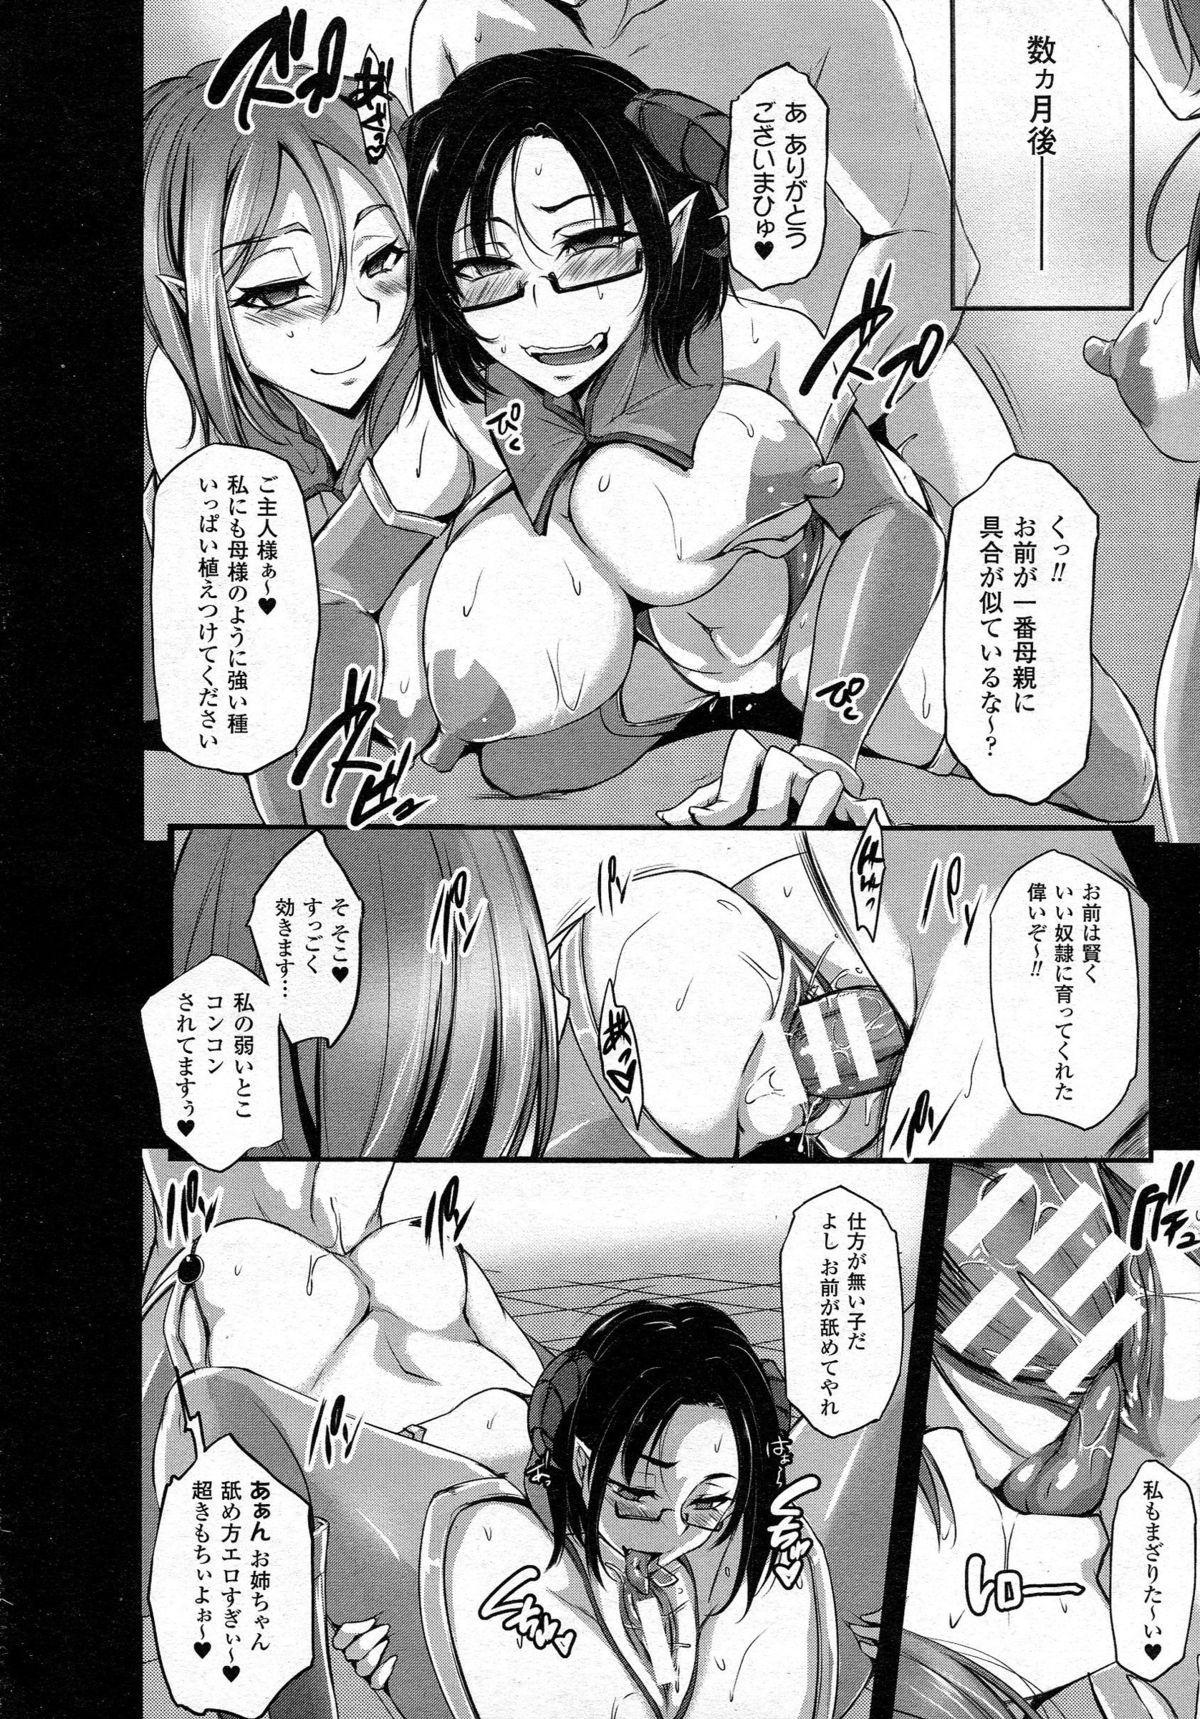 COMIC Unreal 2015-06 Vol. 55 + Hisasi Illust Shuu 439